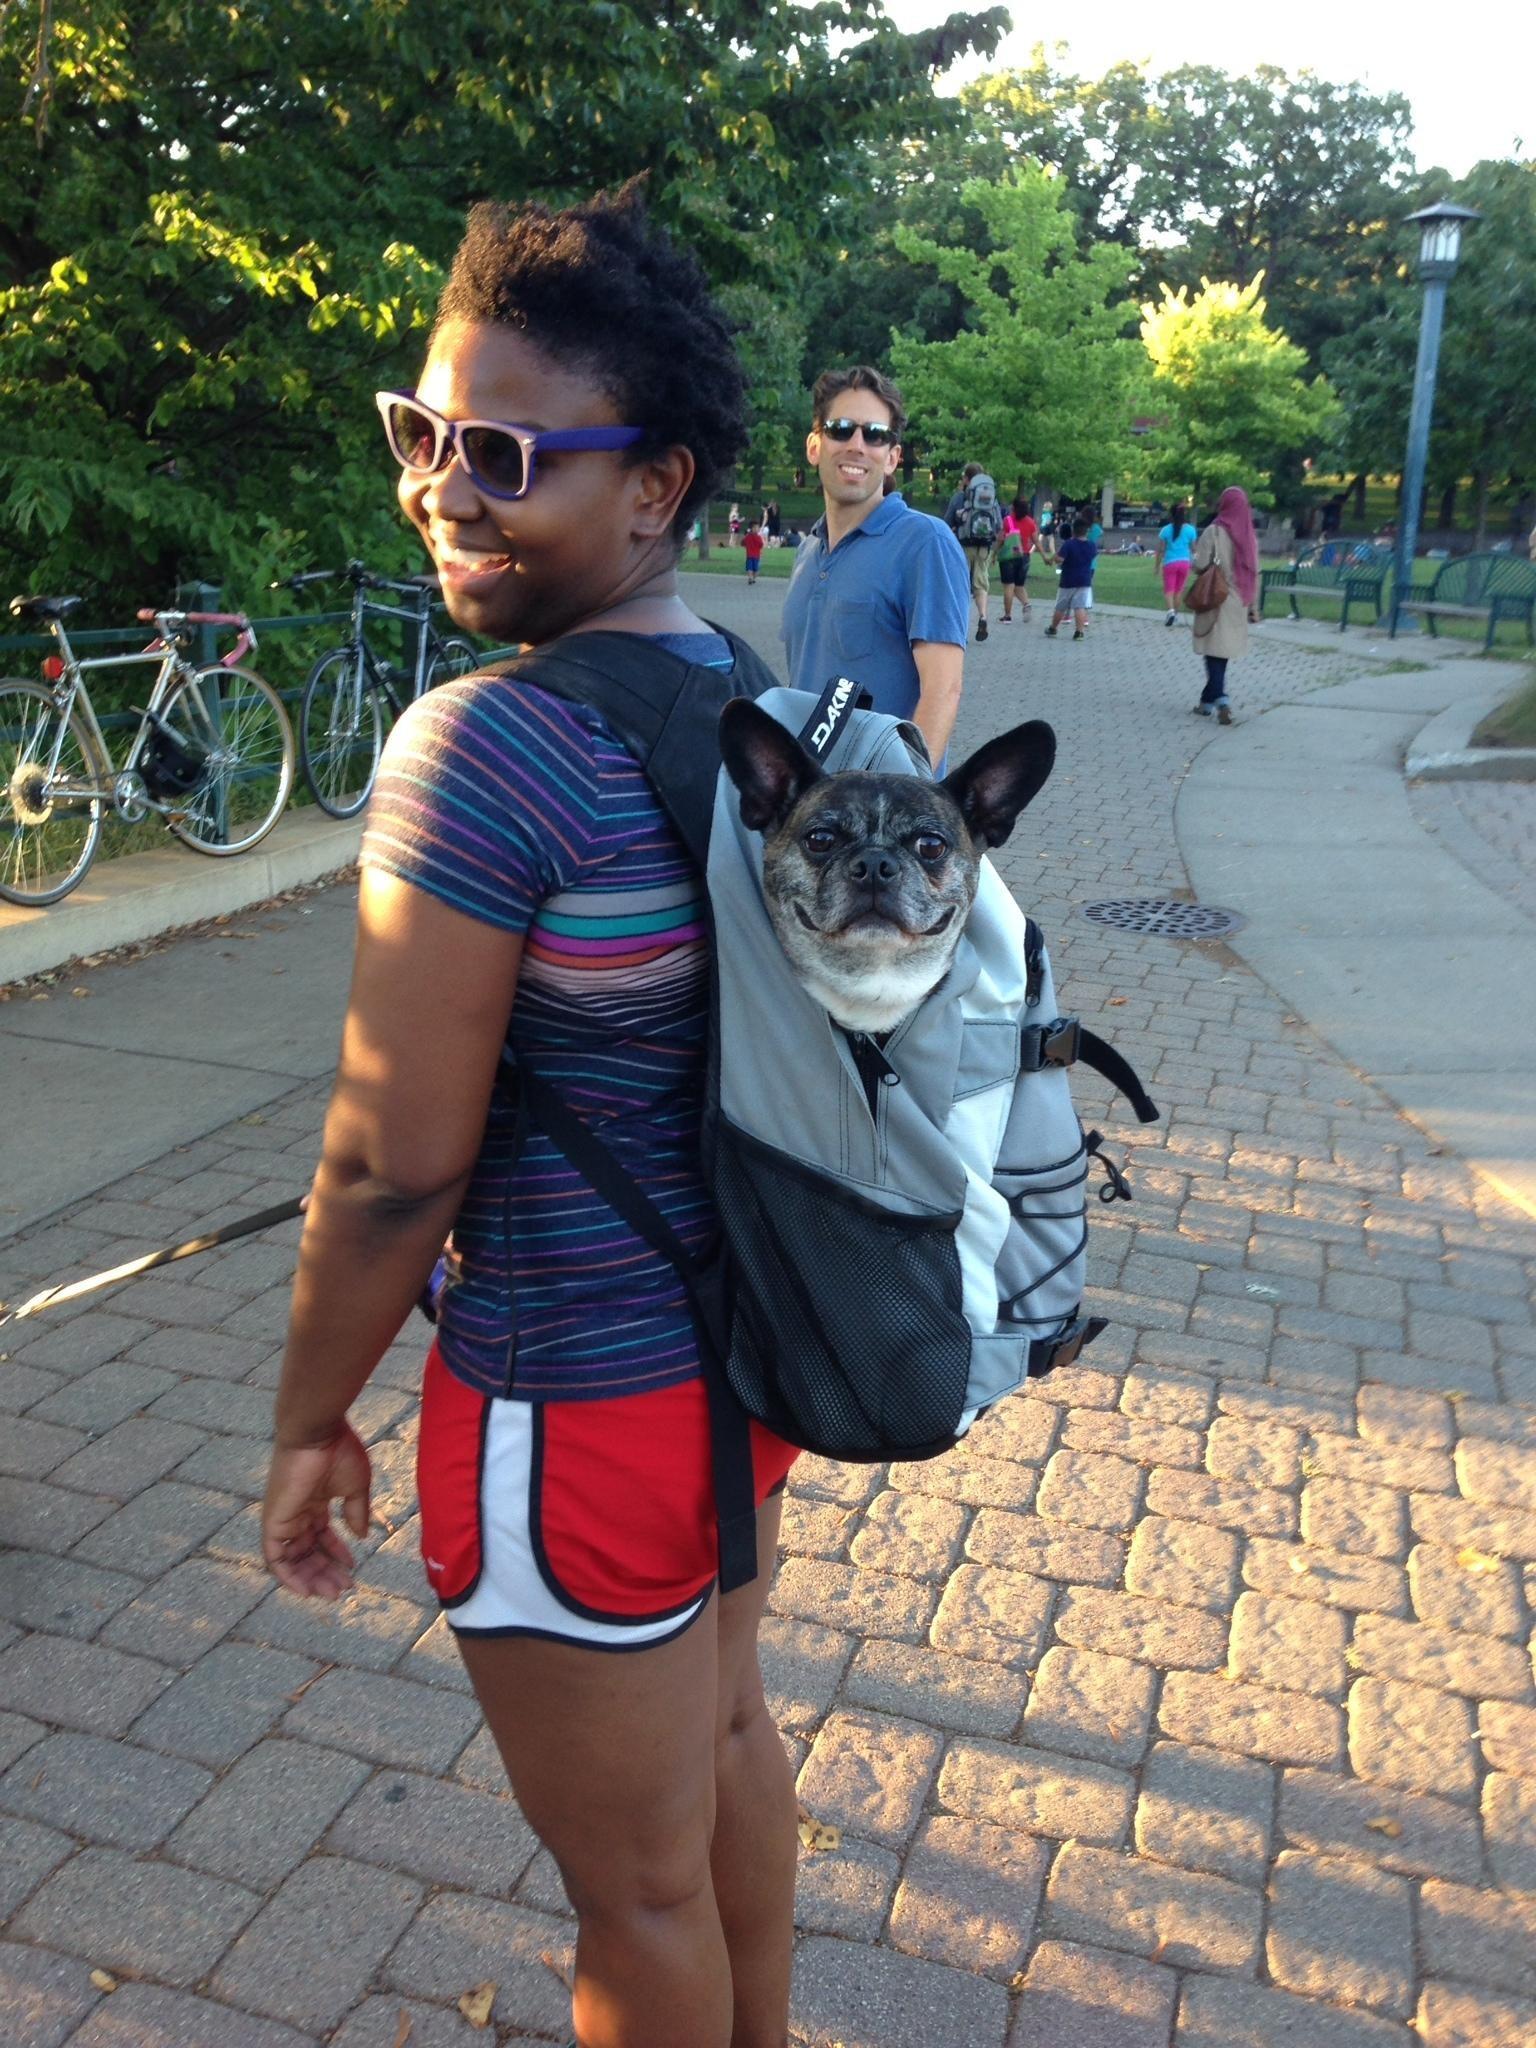 Nichole's dog boarding